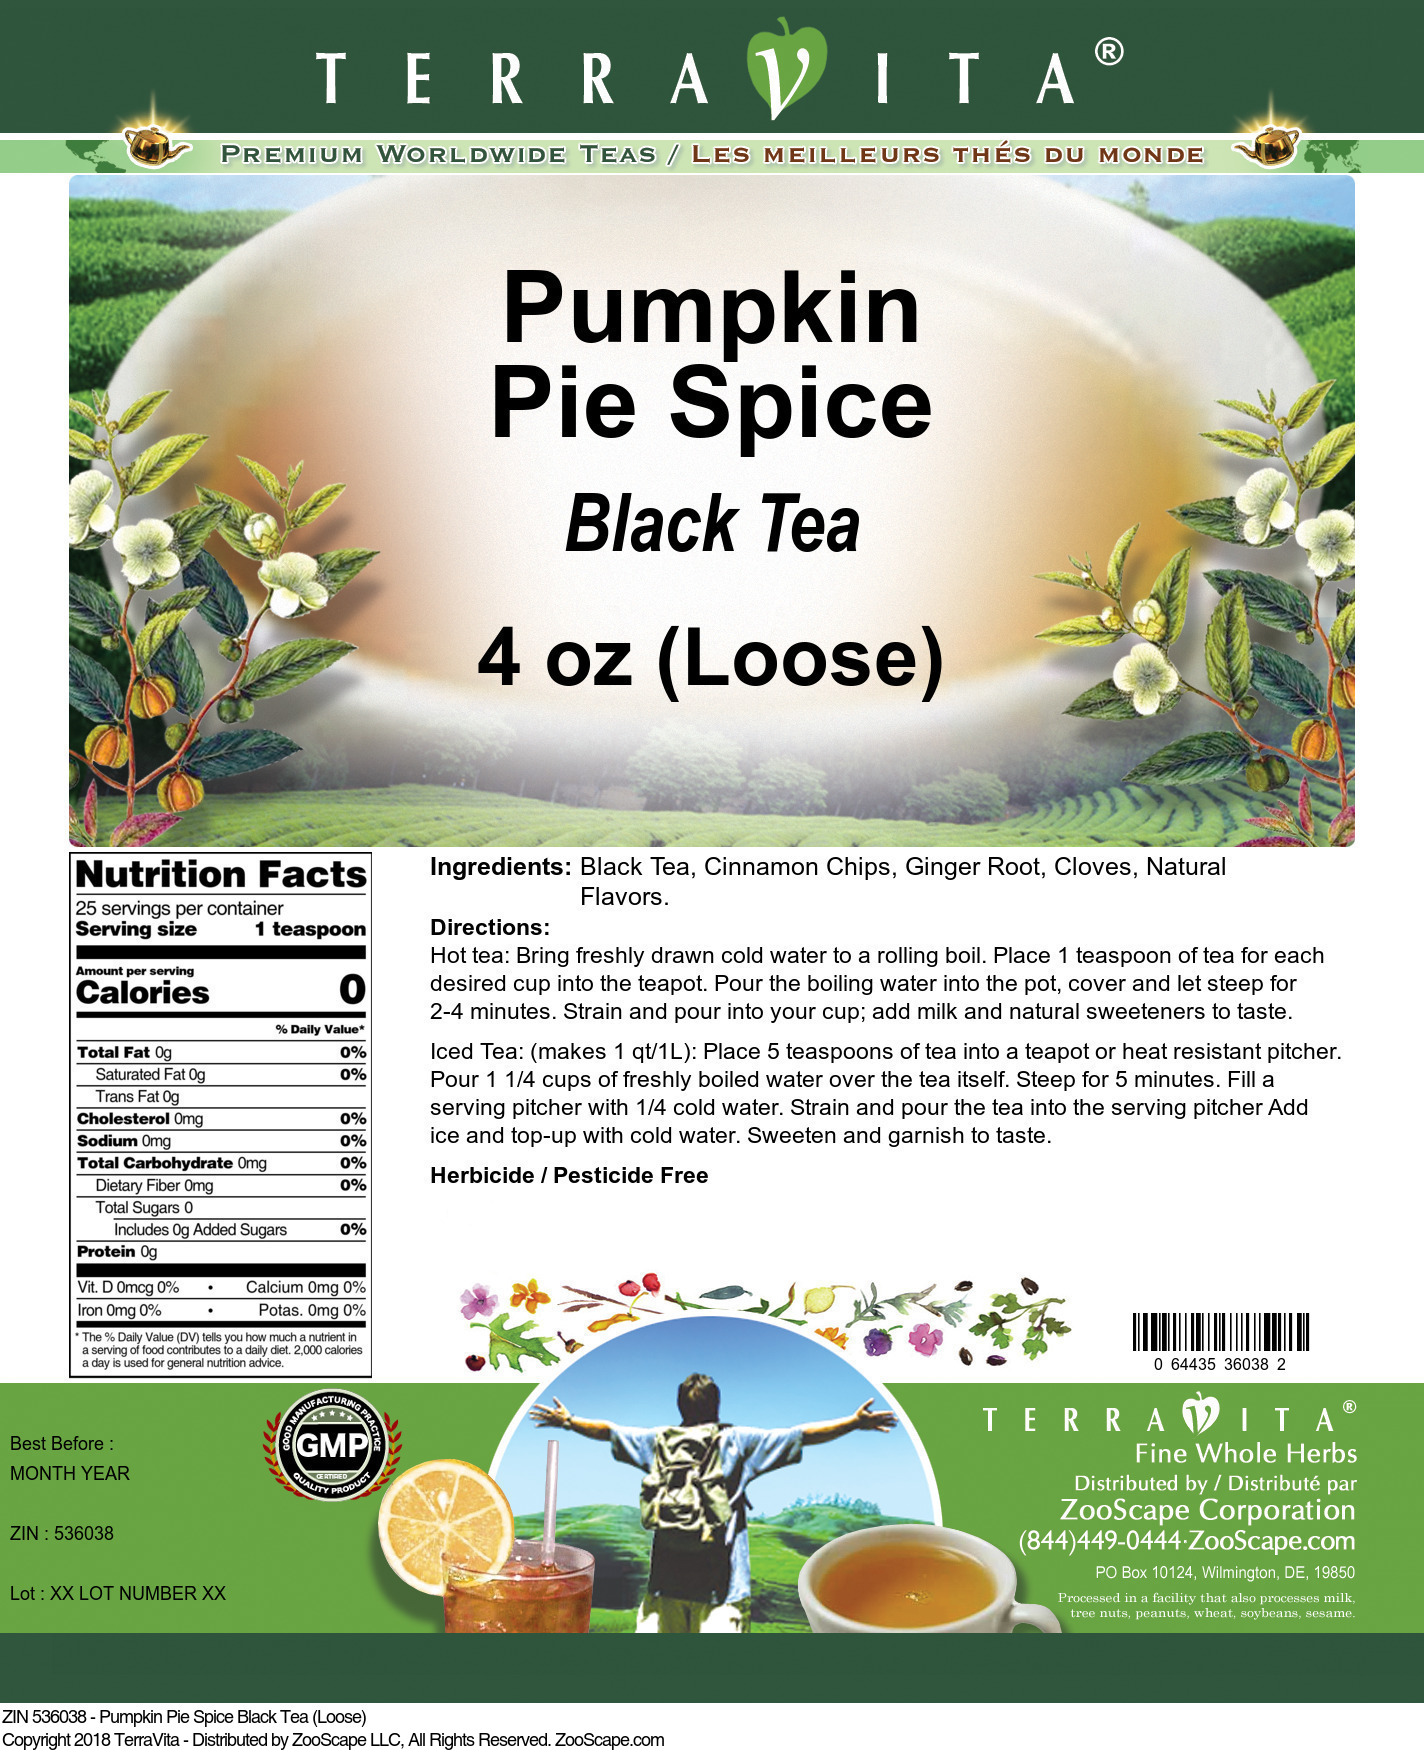 Pumpkin Pie Spice Black Tea